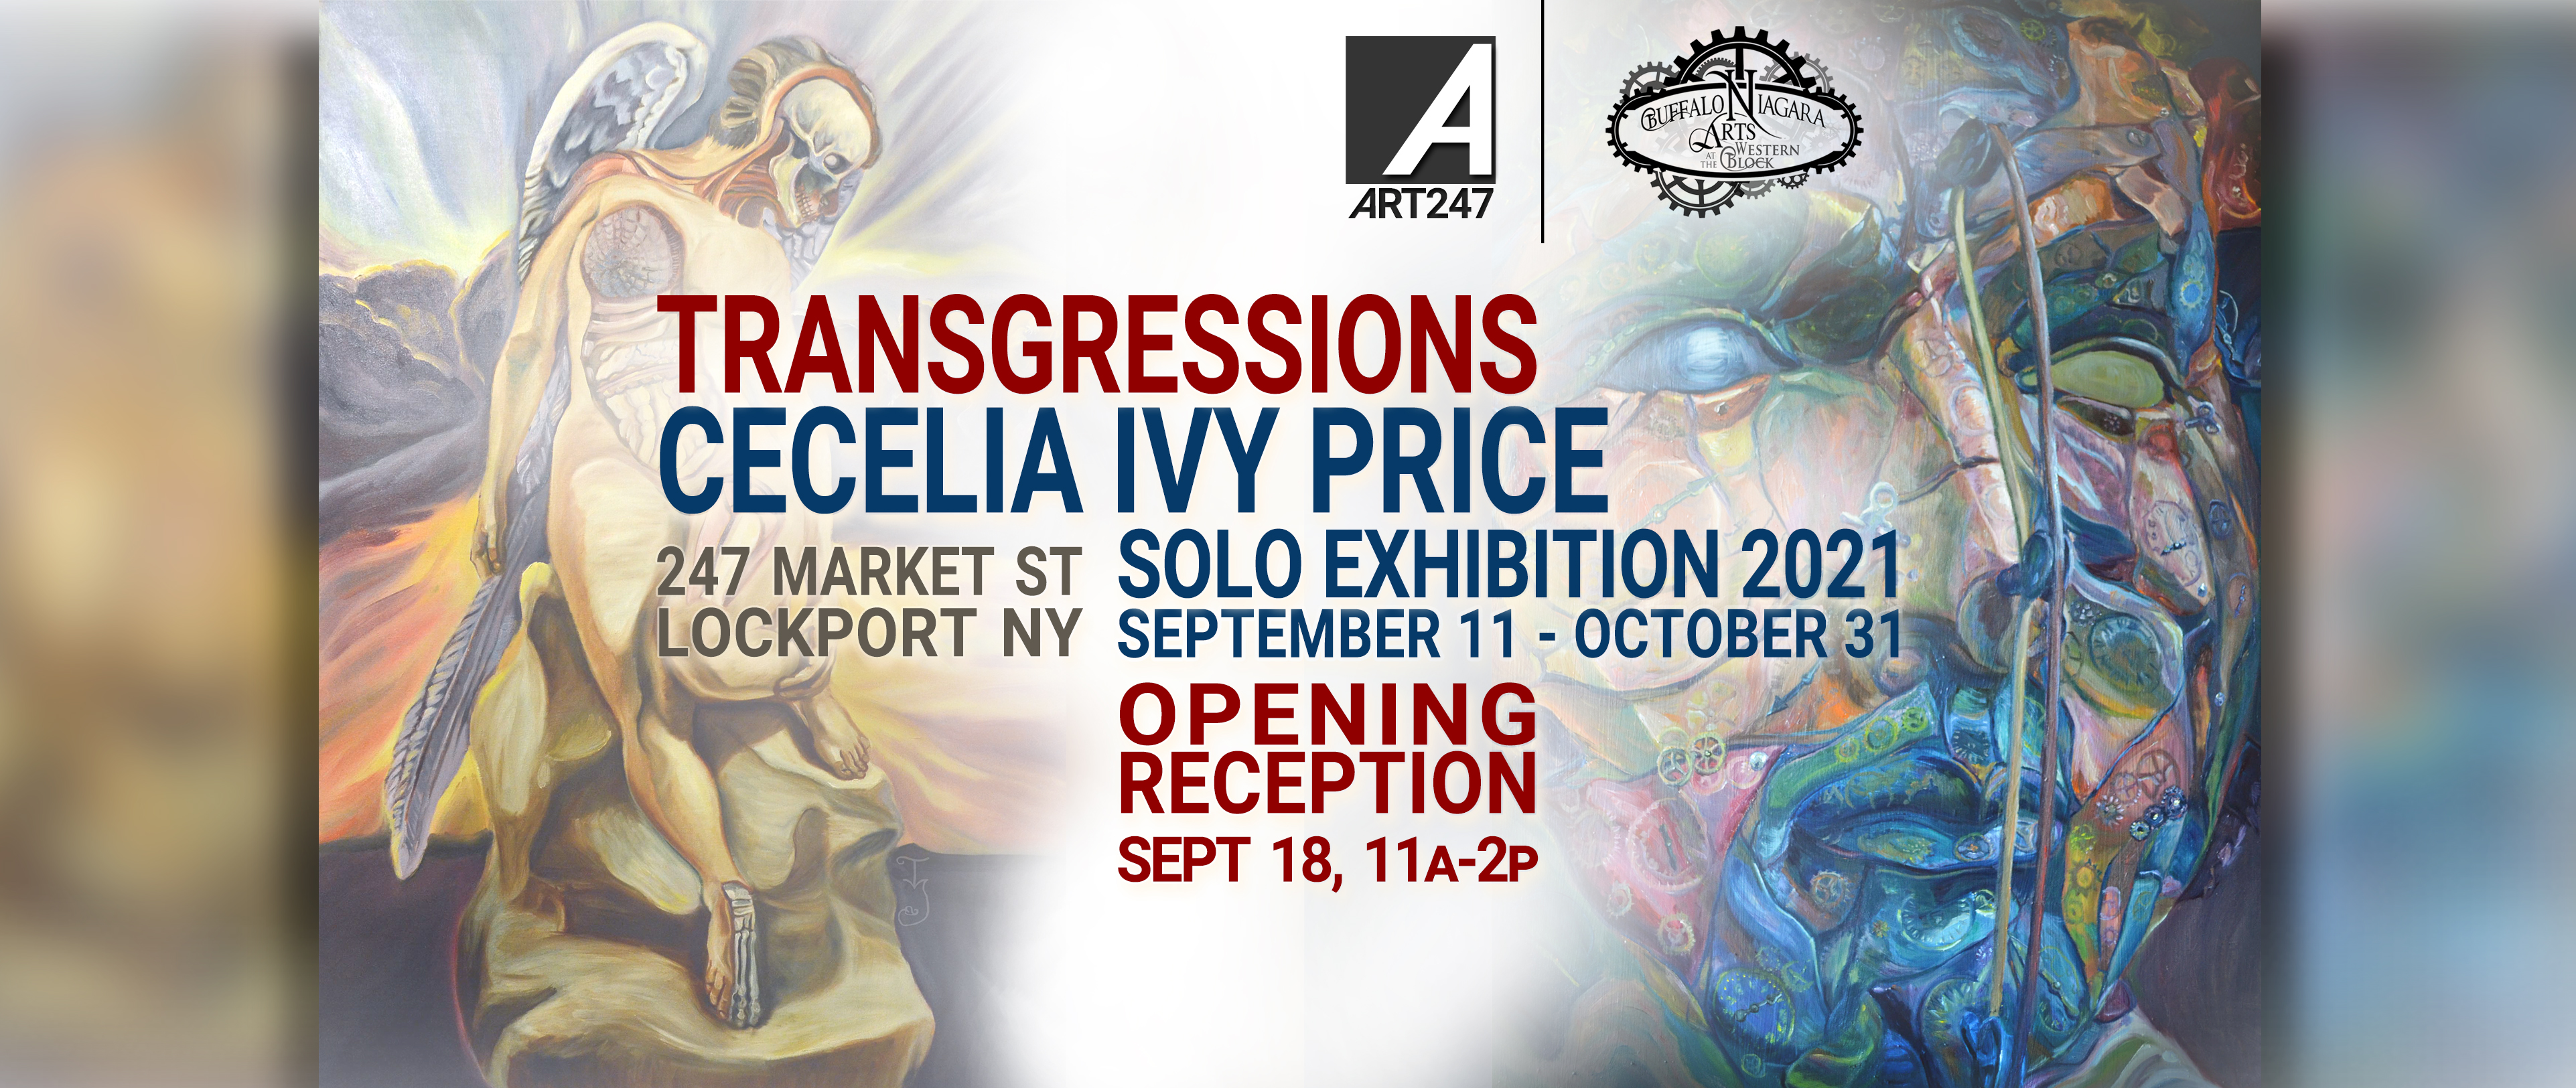 Transgressions | Cecelia